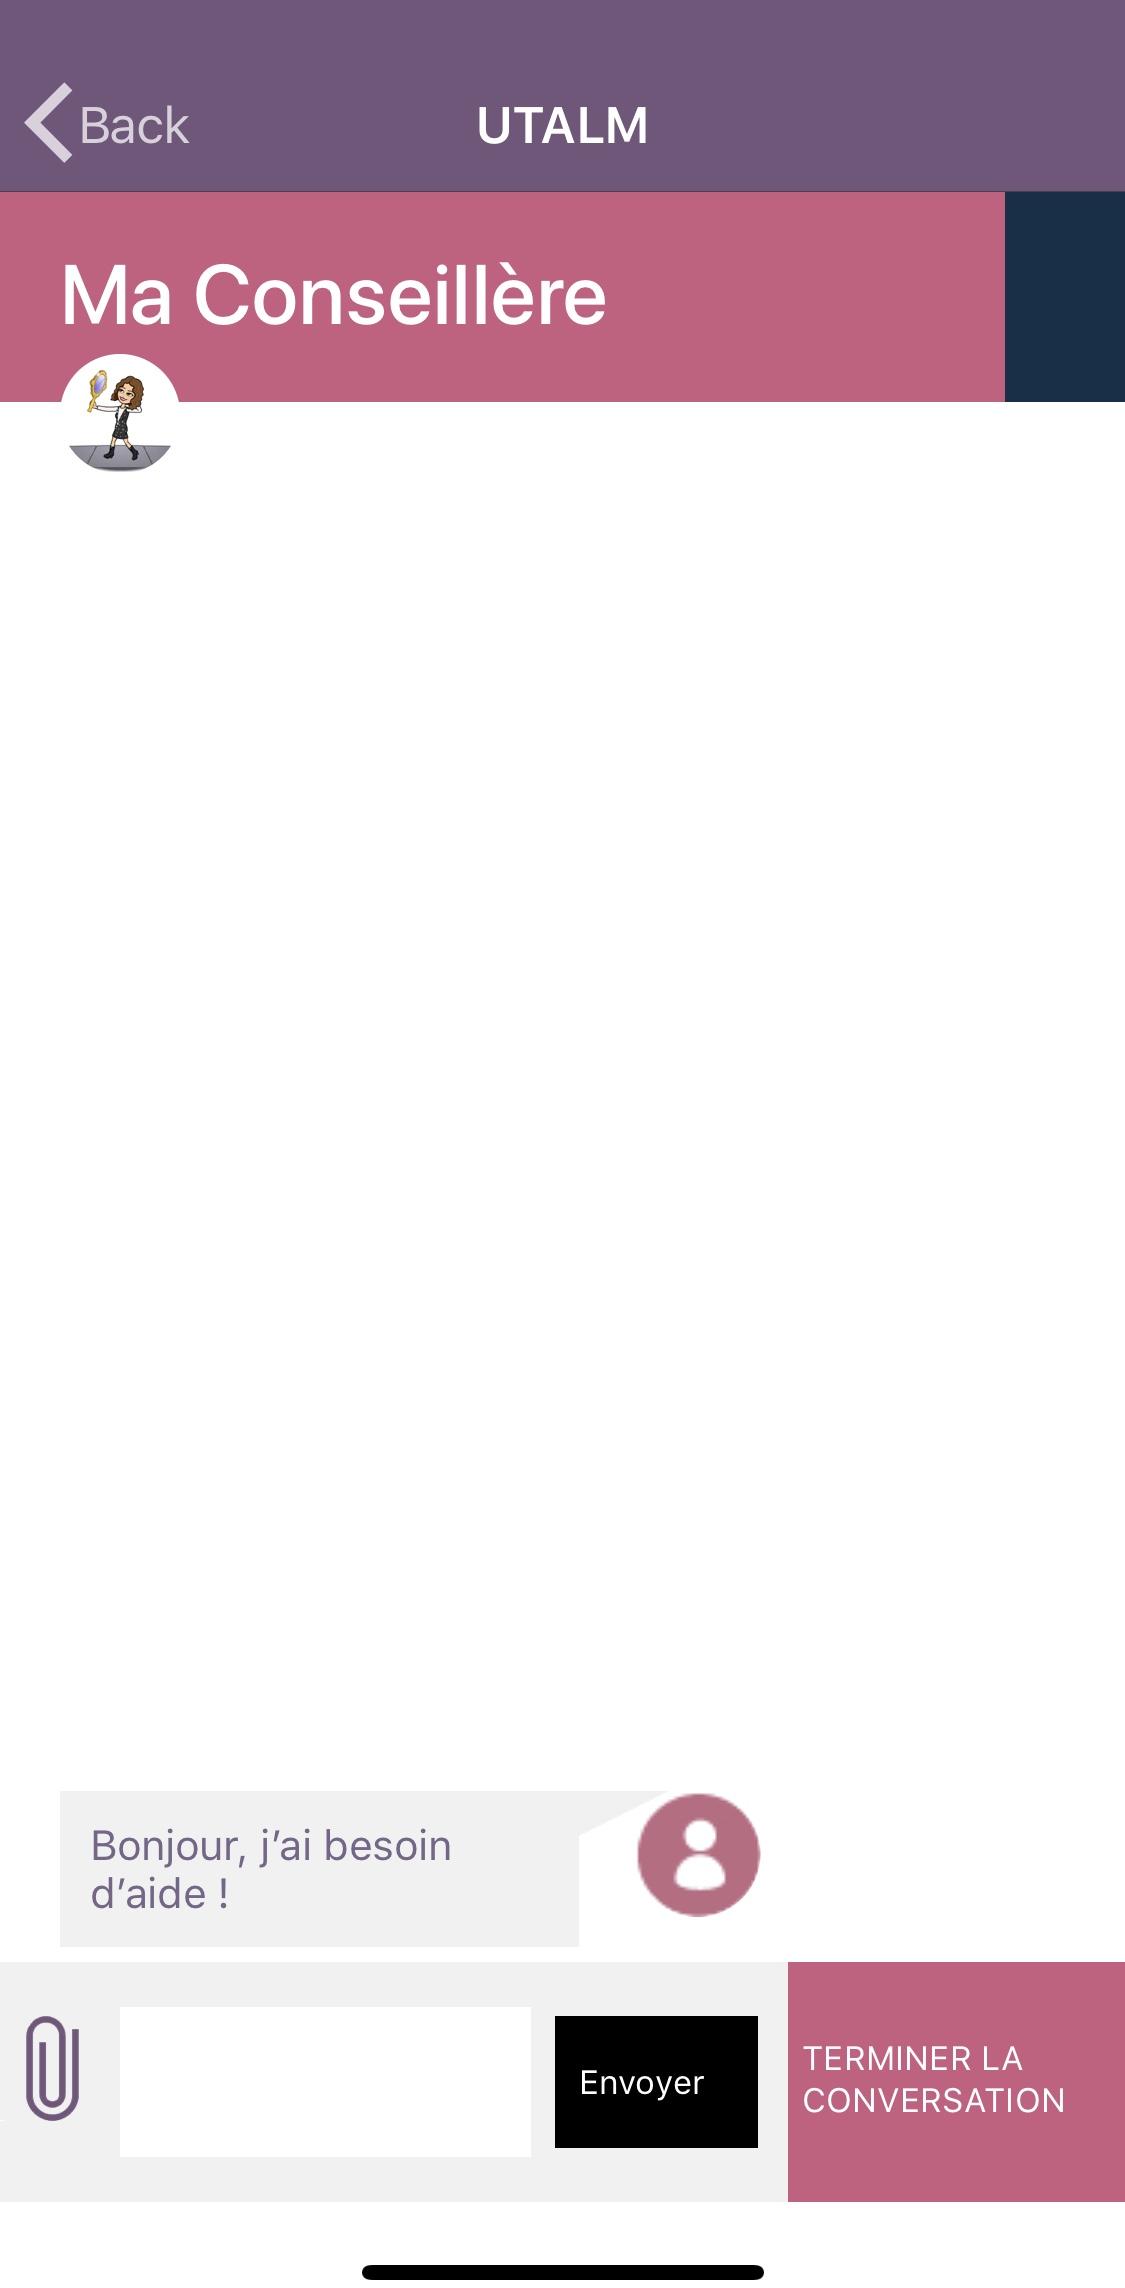 application-utalm-untrucalamode-fonction-maconseillere-conseil-image